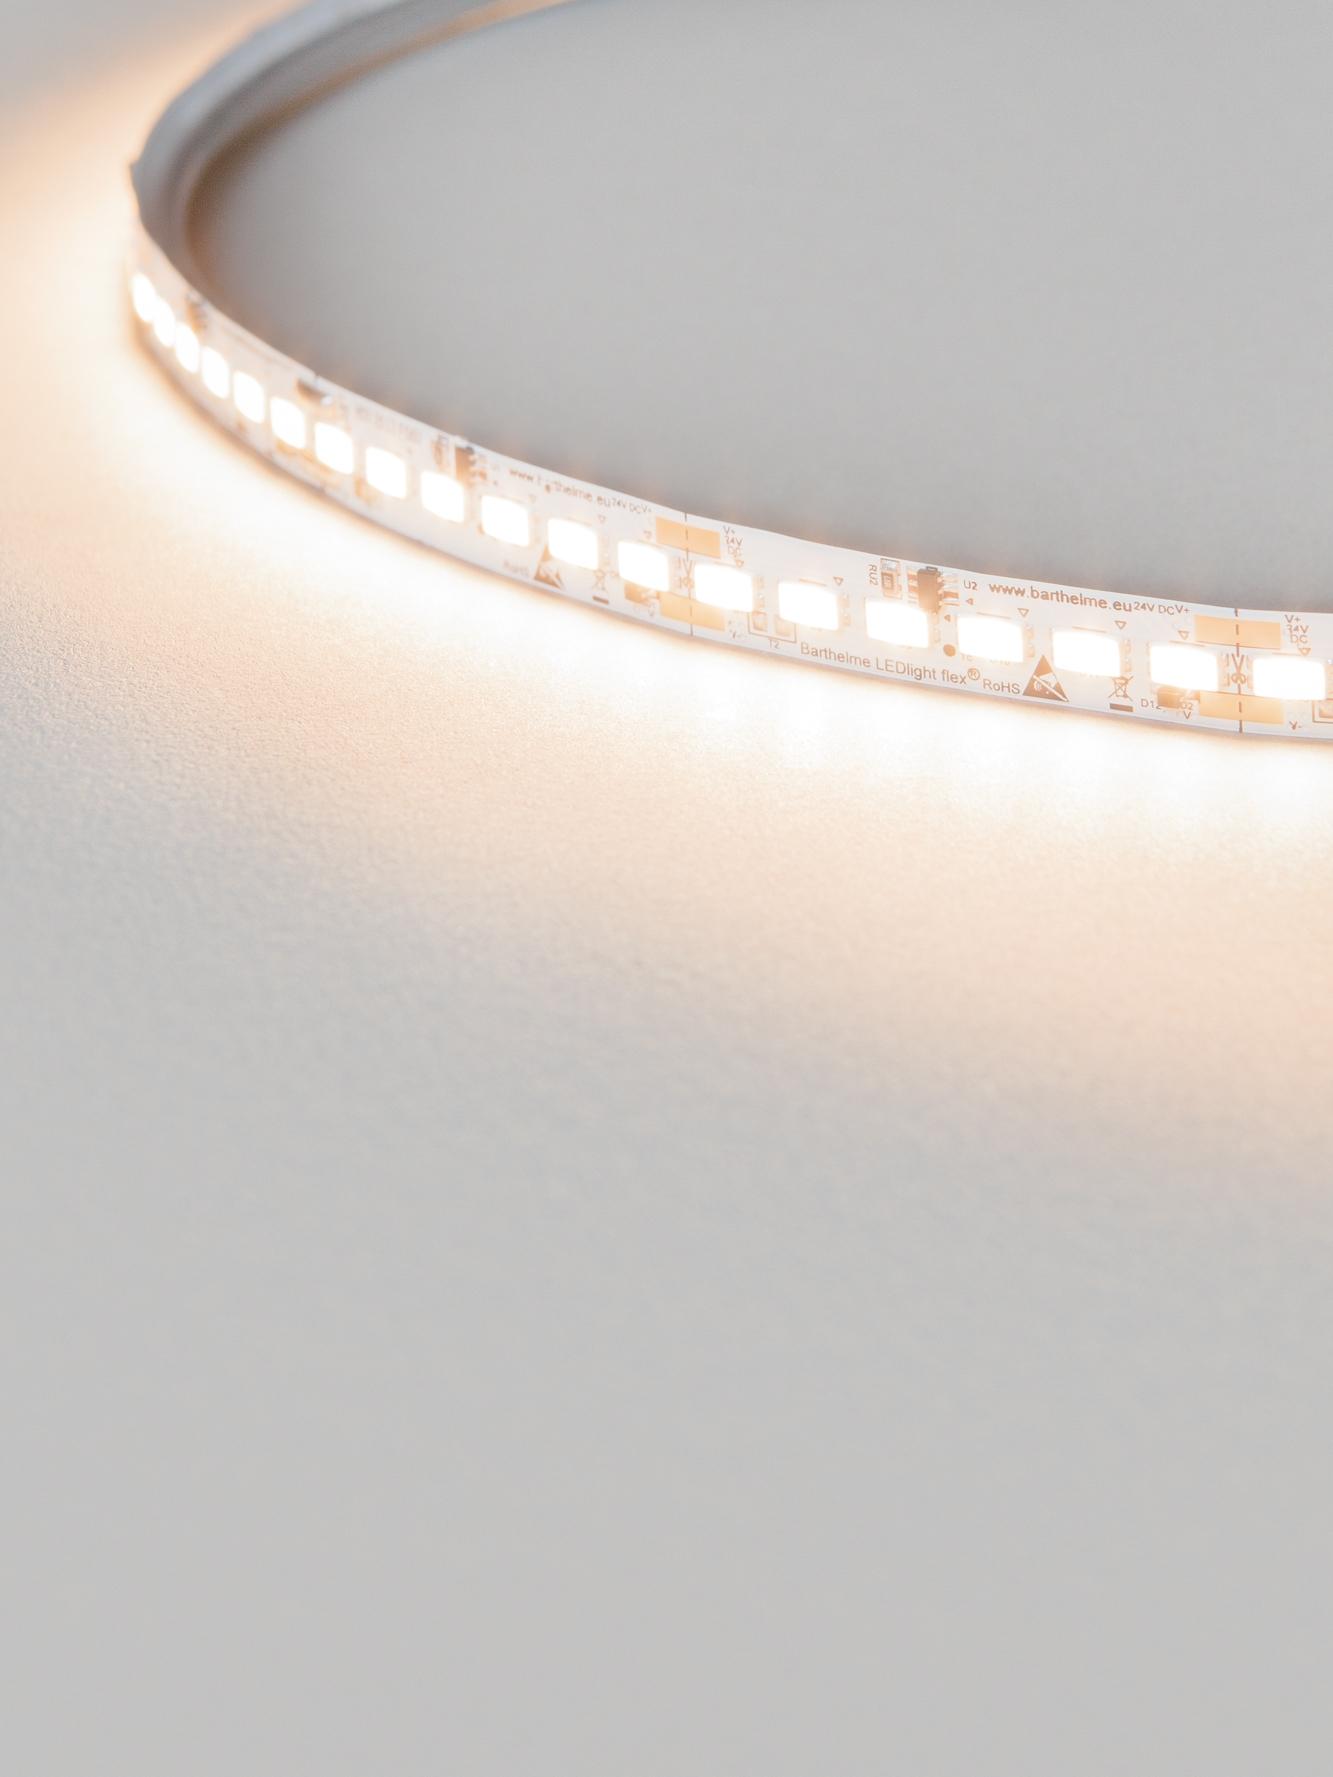 ledlight flex07HP(B1)-1.JPG